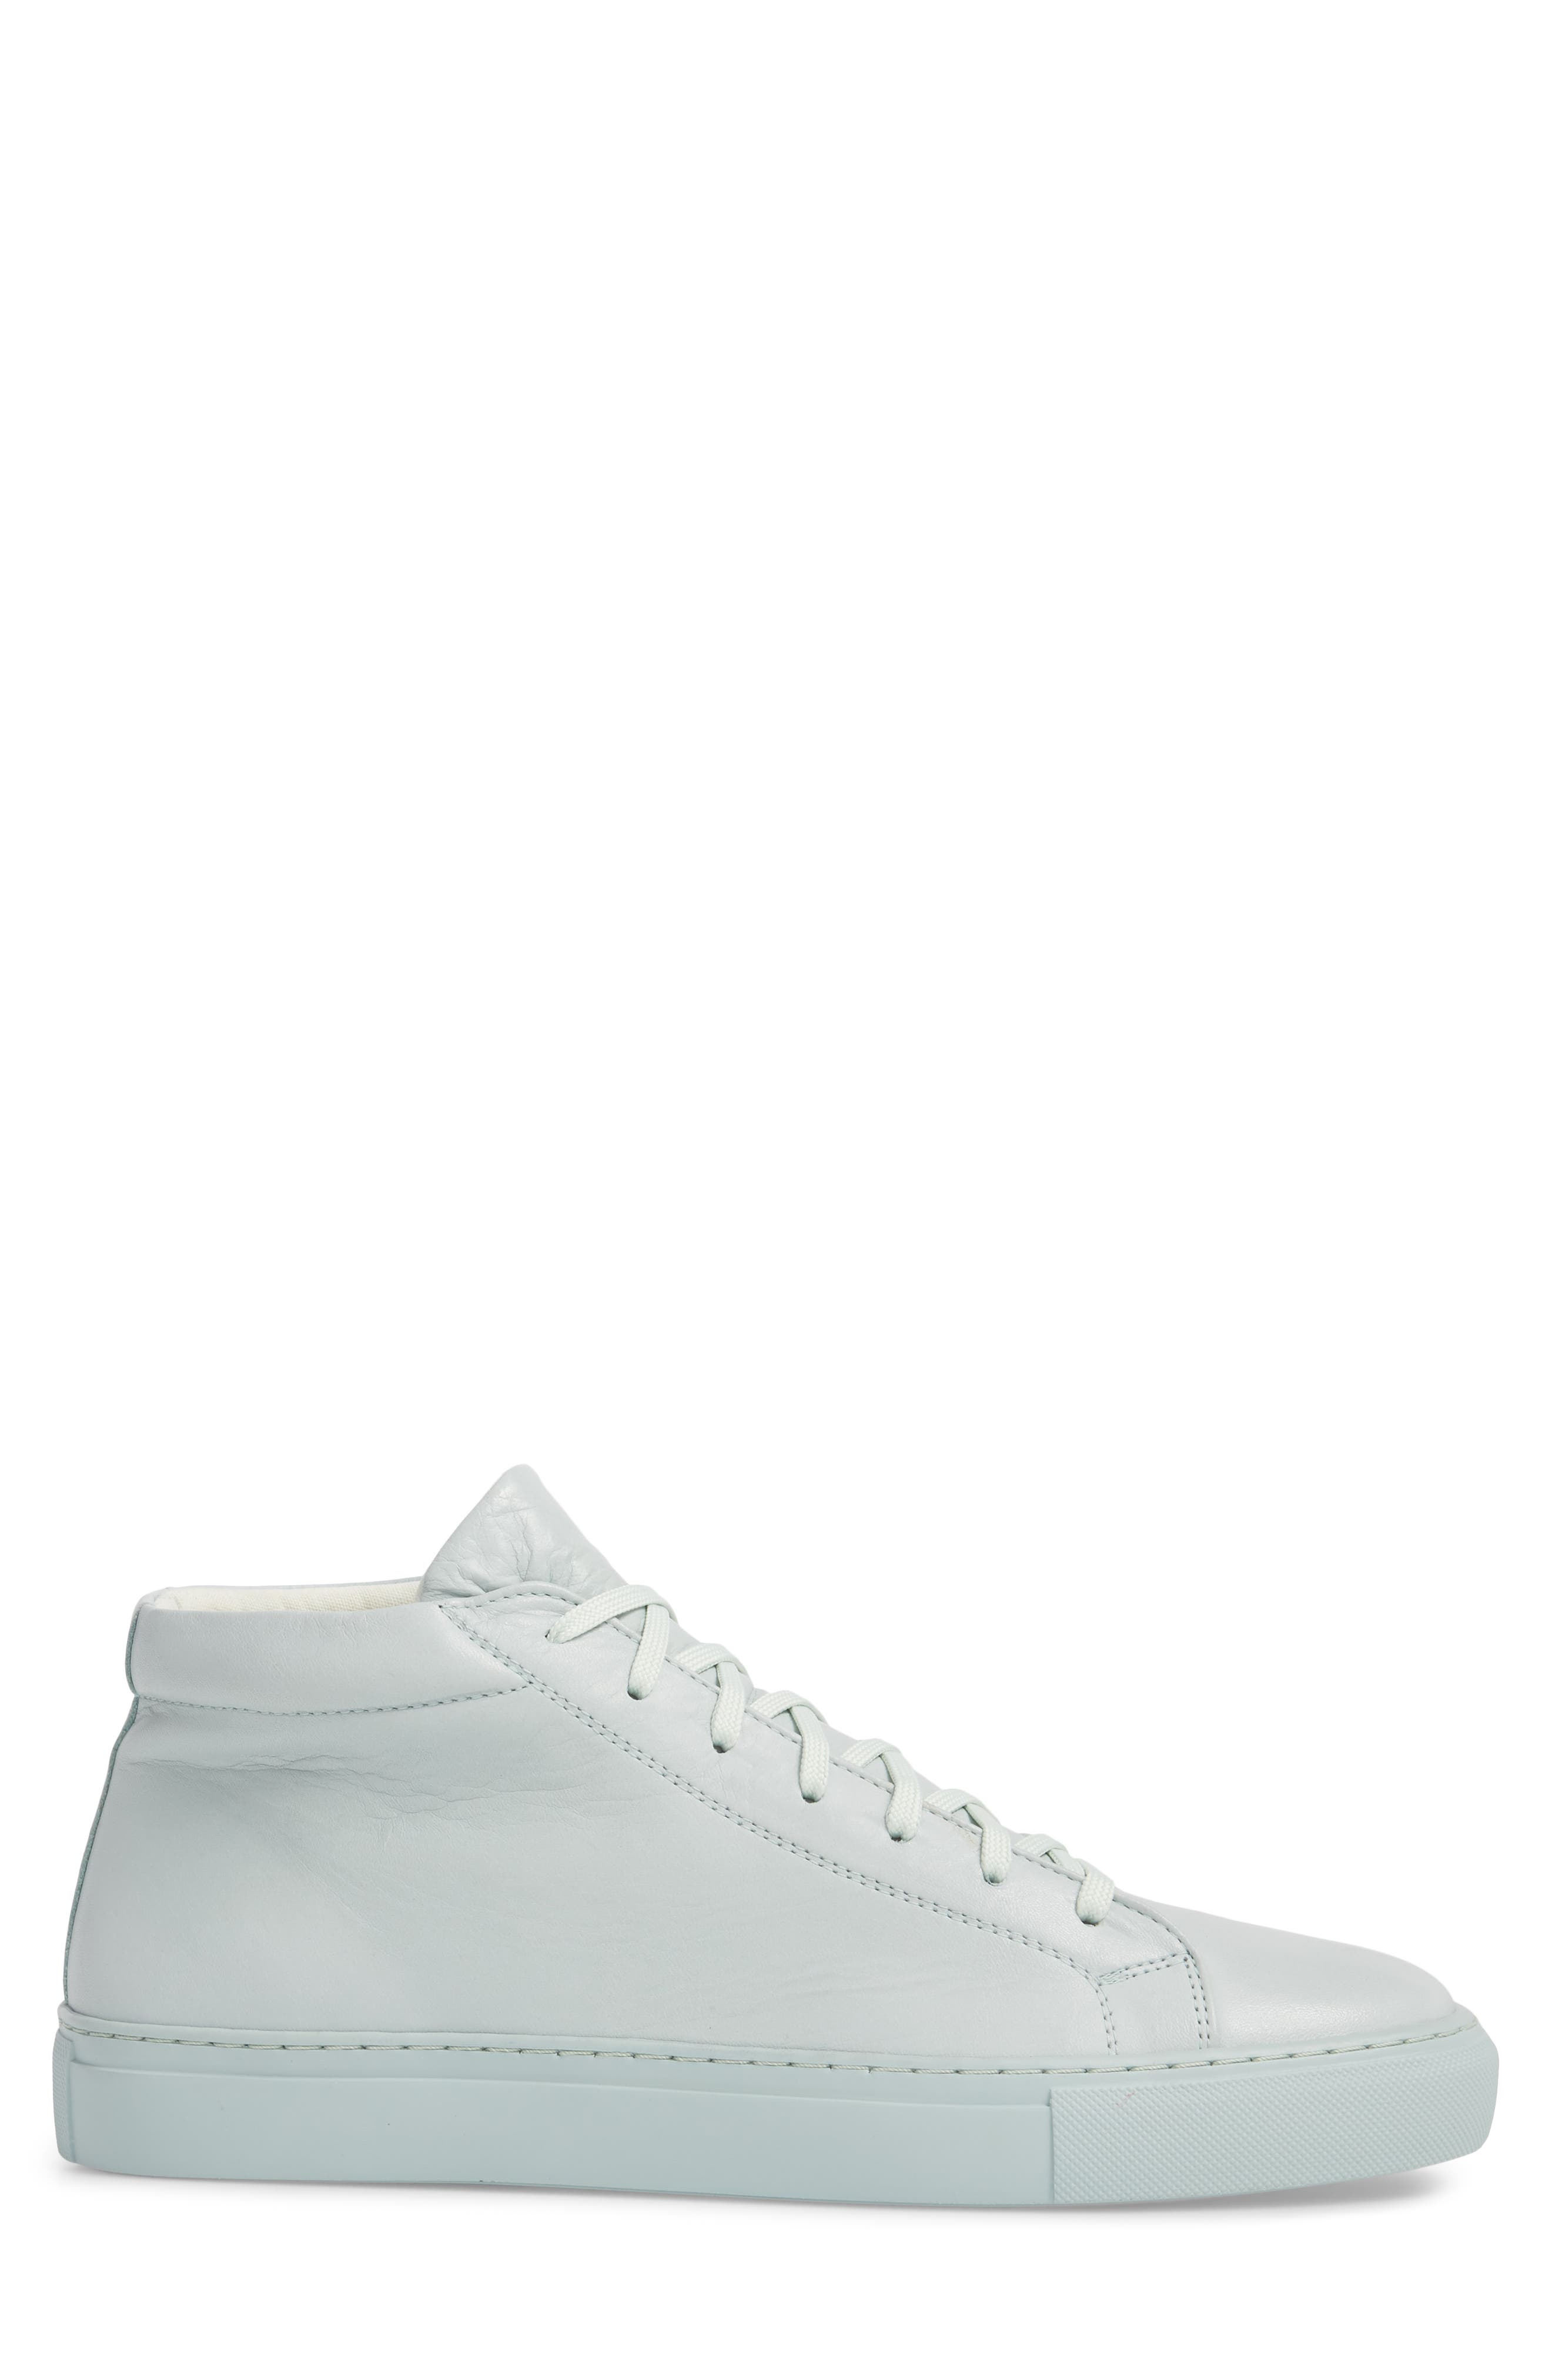 Lexington Mid Top Sneaker,                             Alternate thumbnail 3, color,                             303